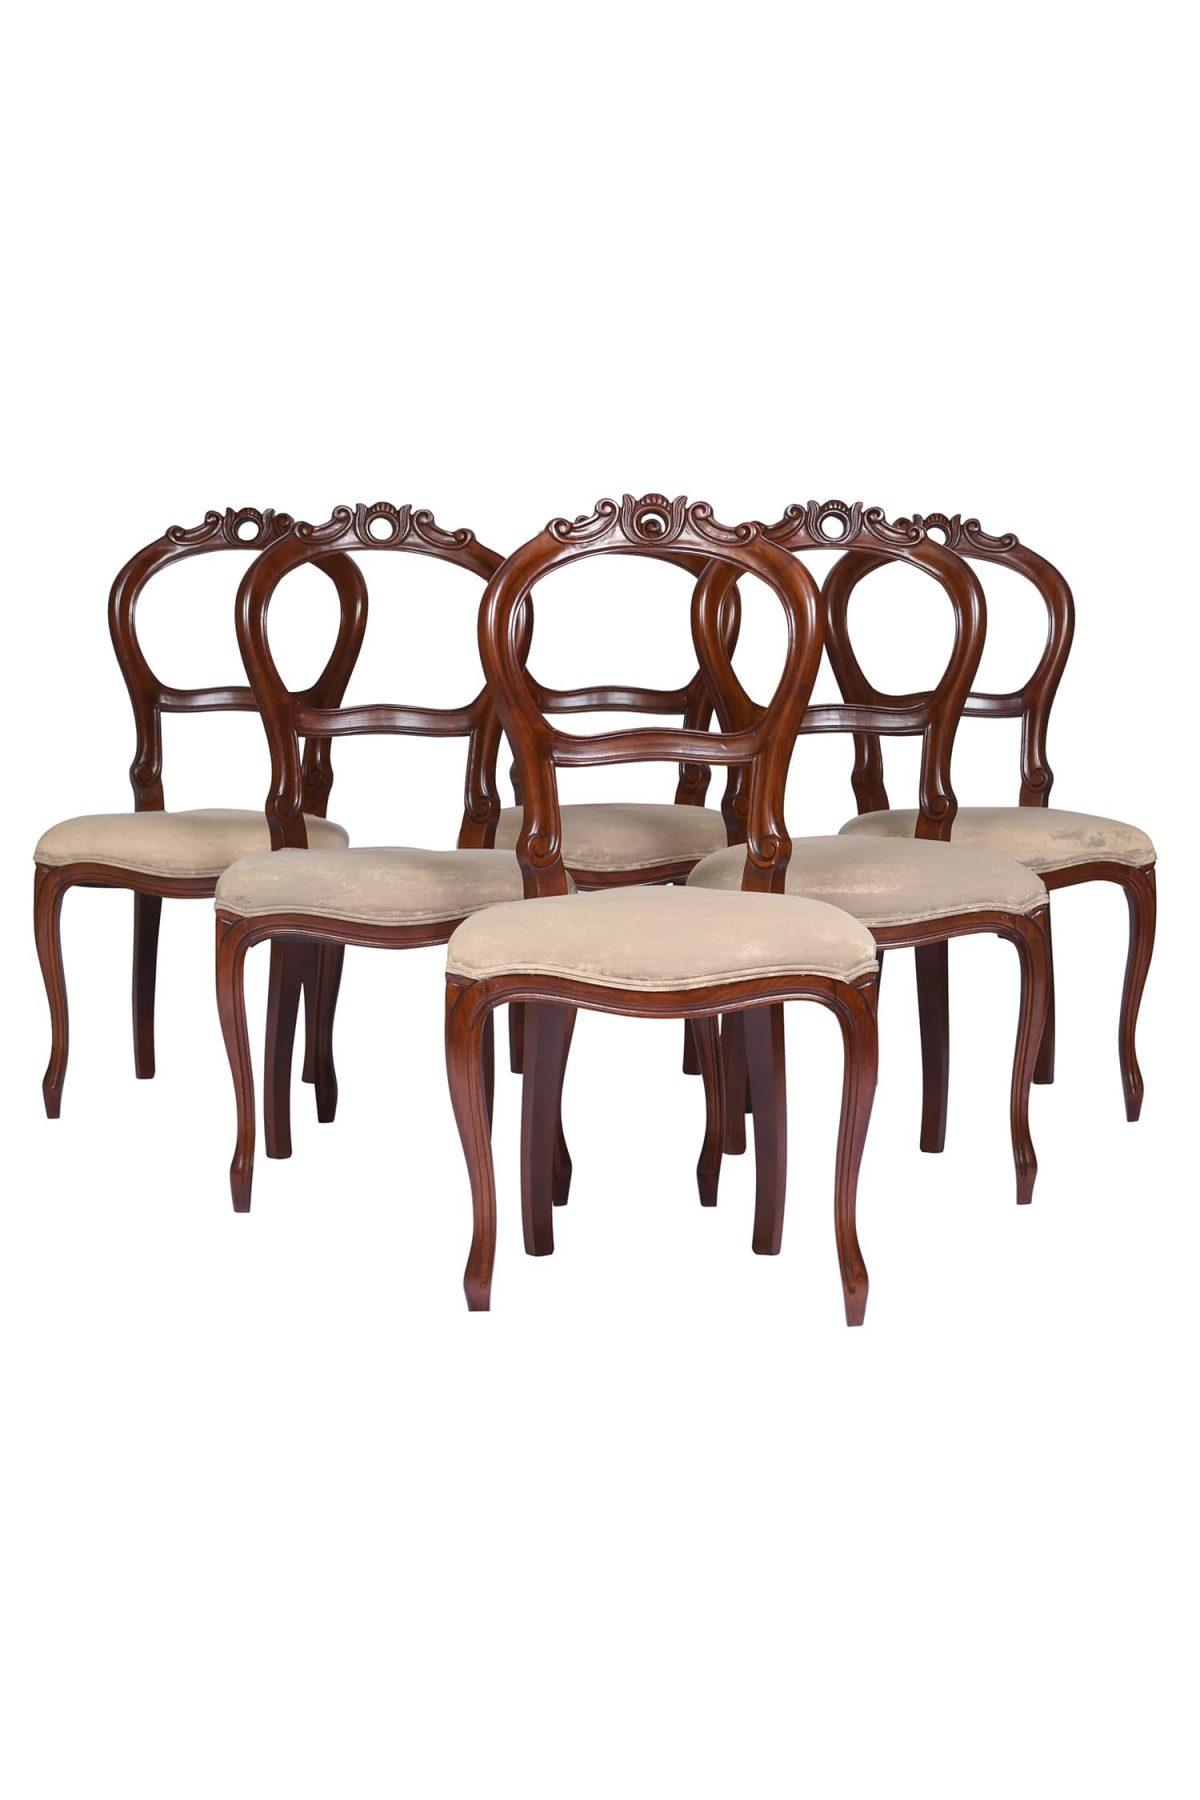 Set 6 (six ) Balloon-Back Walnut Victorian Dining Chairs, English c.a.1900's